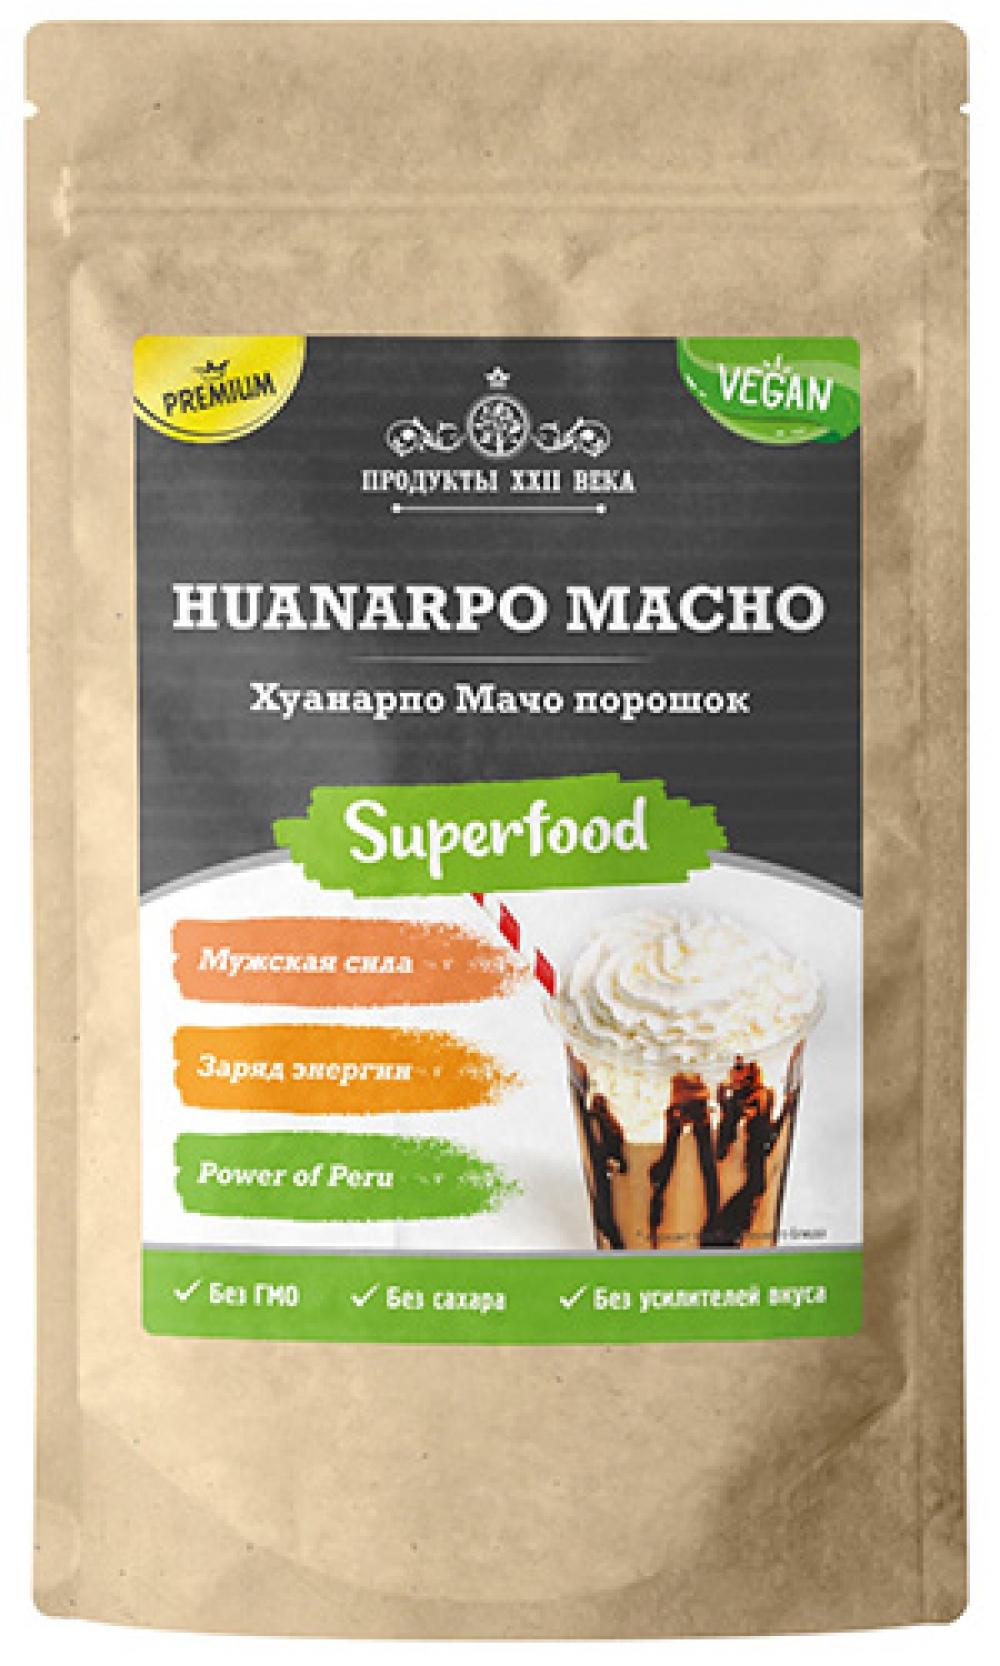 Хуанарпо Мачо Суперфуд, порошок 100г, Продукты XXII века